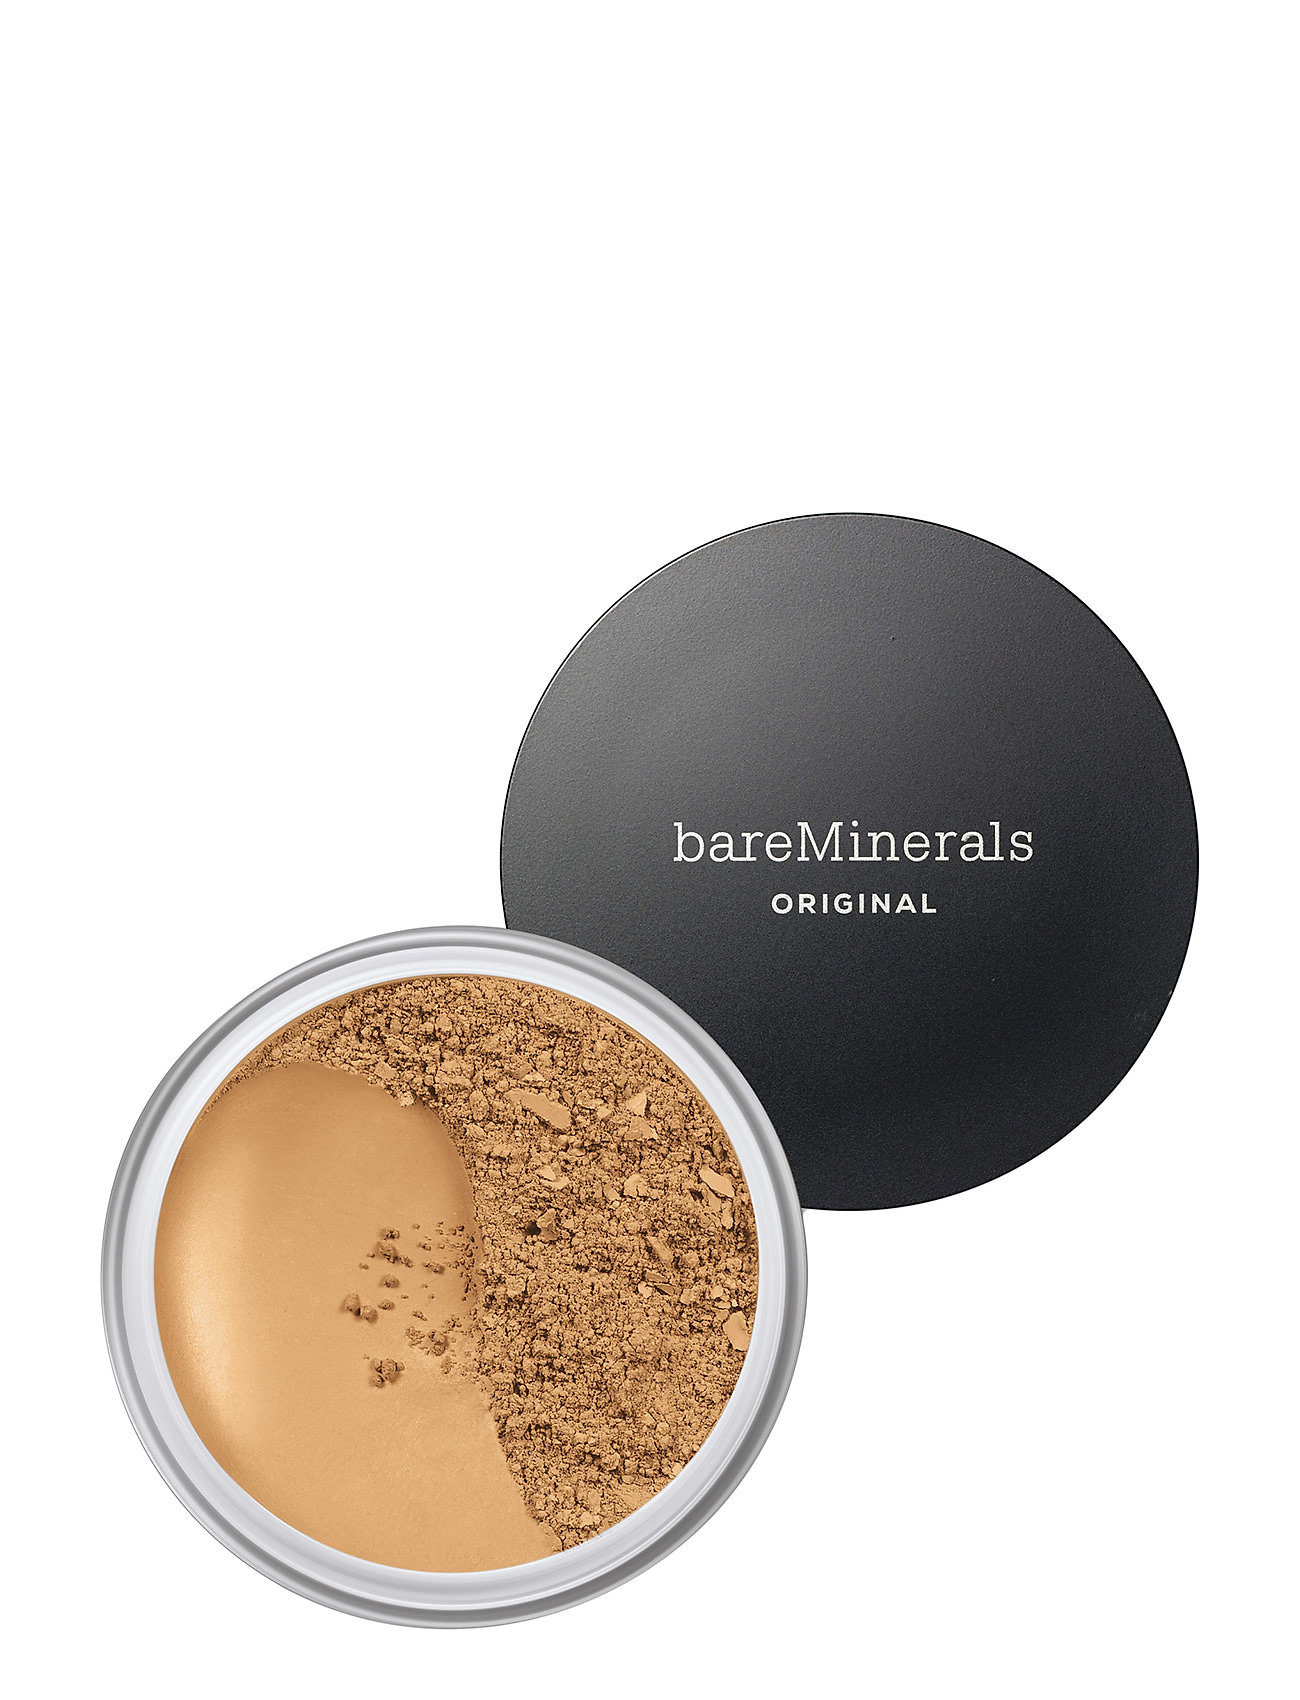 Image of Matte Foundation Spf 15 Foundation Makeup BareMinerals (3308586453)